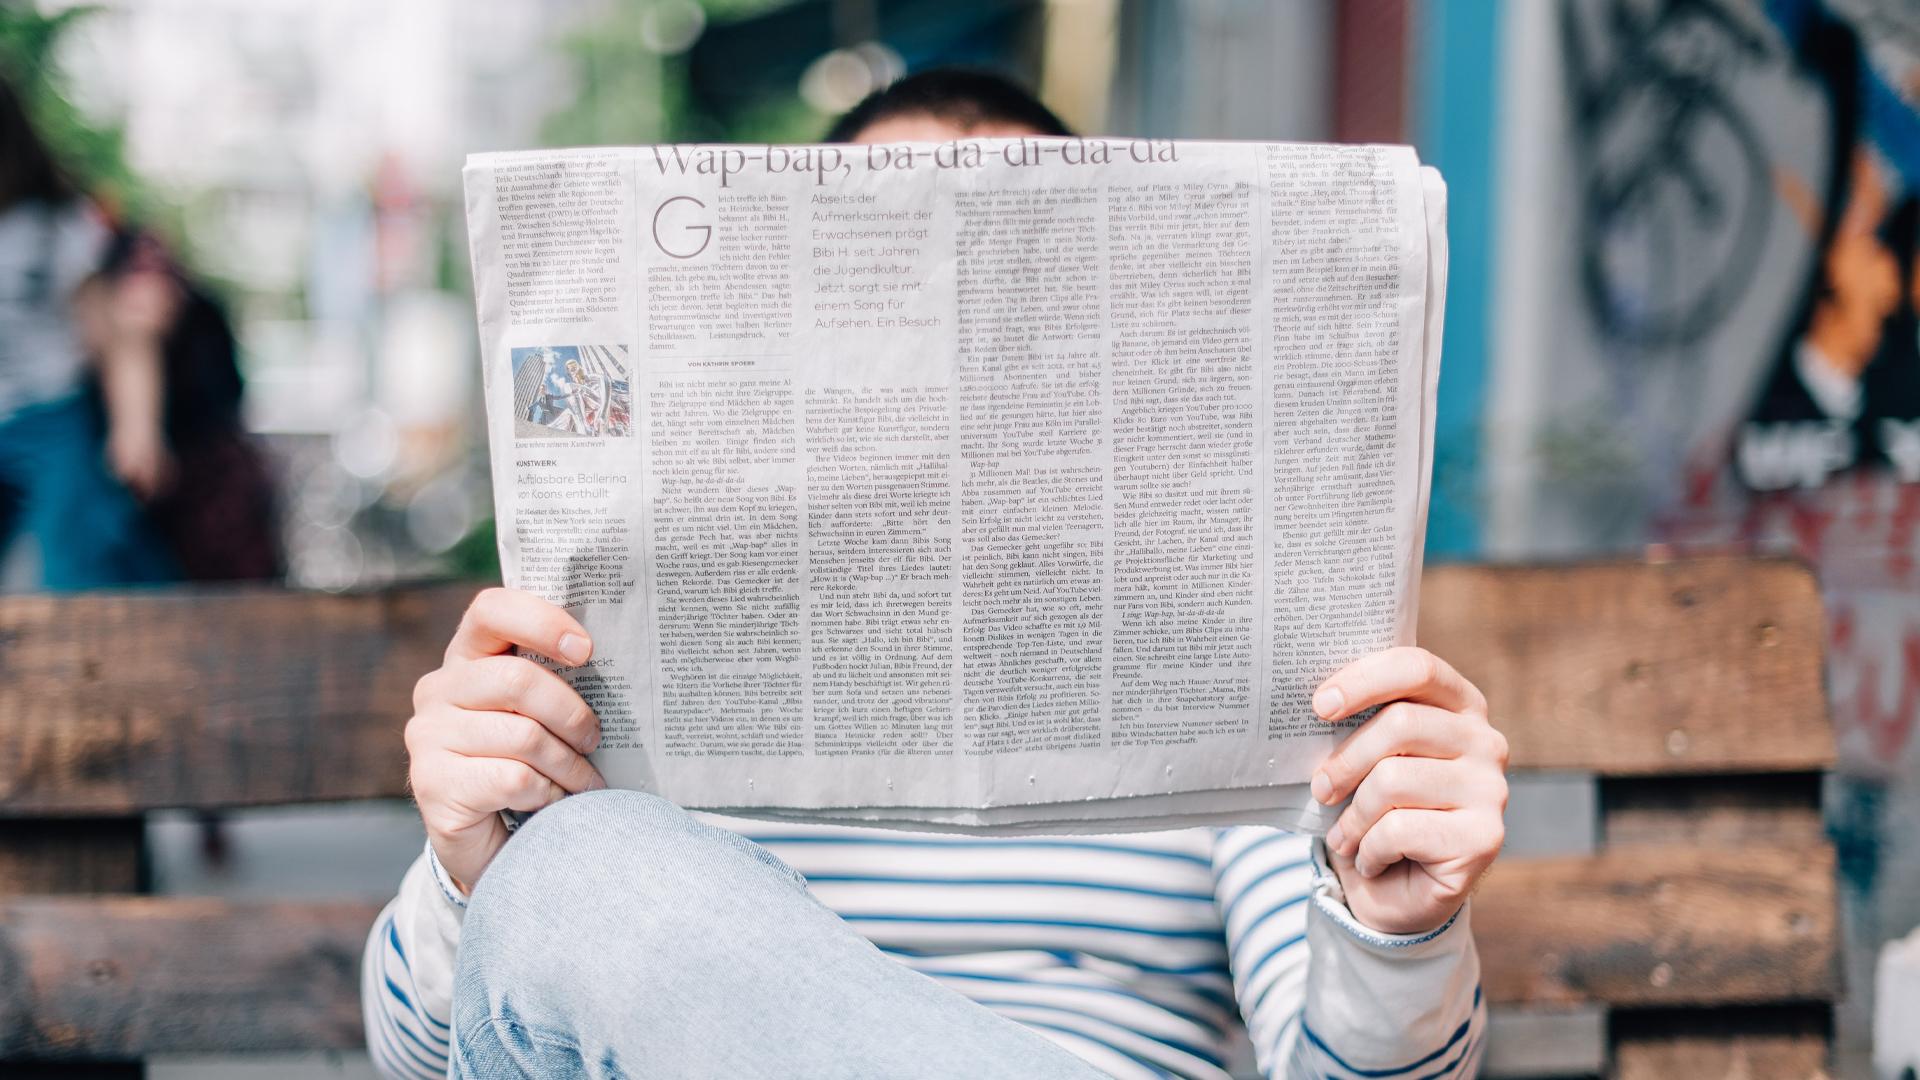 This week's top stories on Industry 4.0